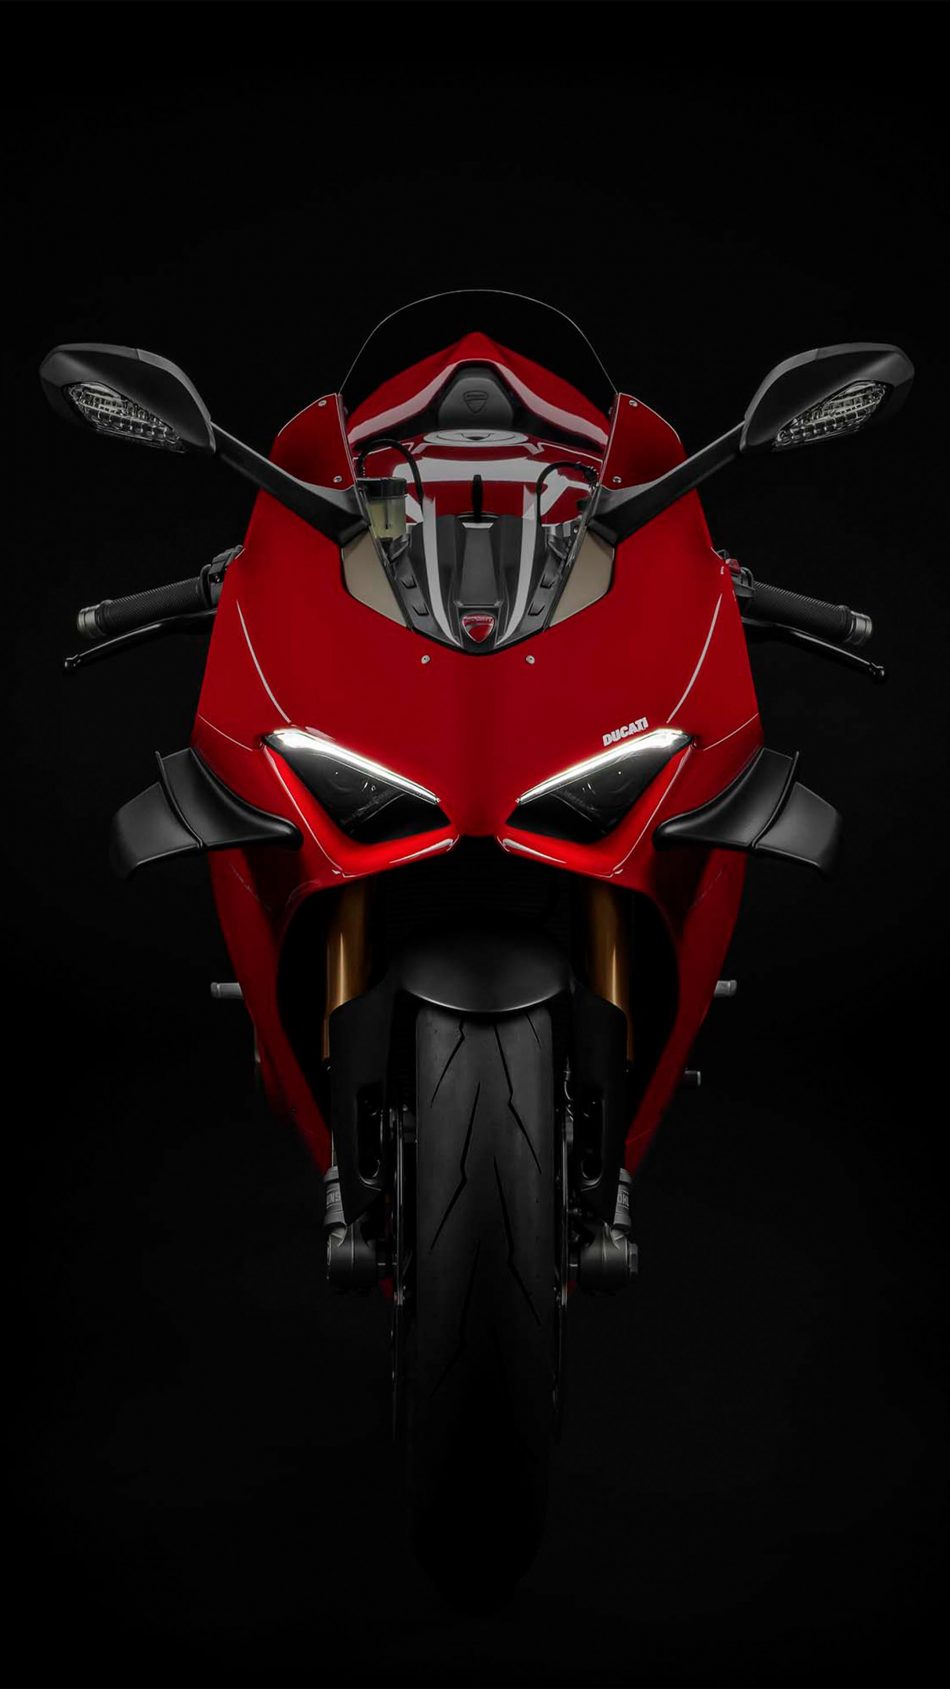 Ducati Panigale V4 2020 4K Ultra HD Mobile Wallpaper